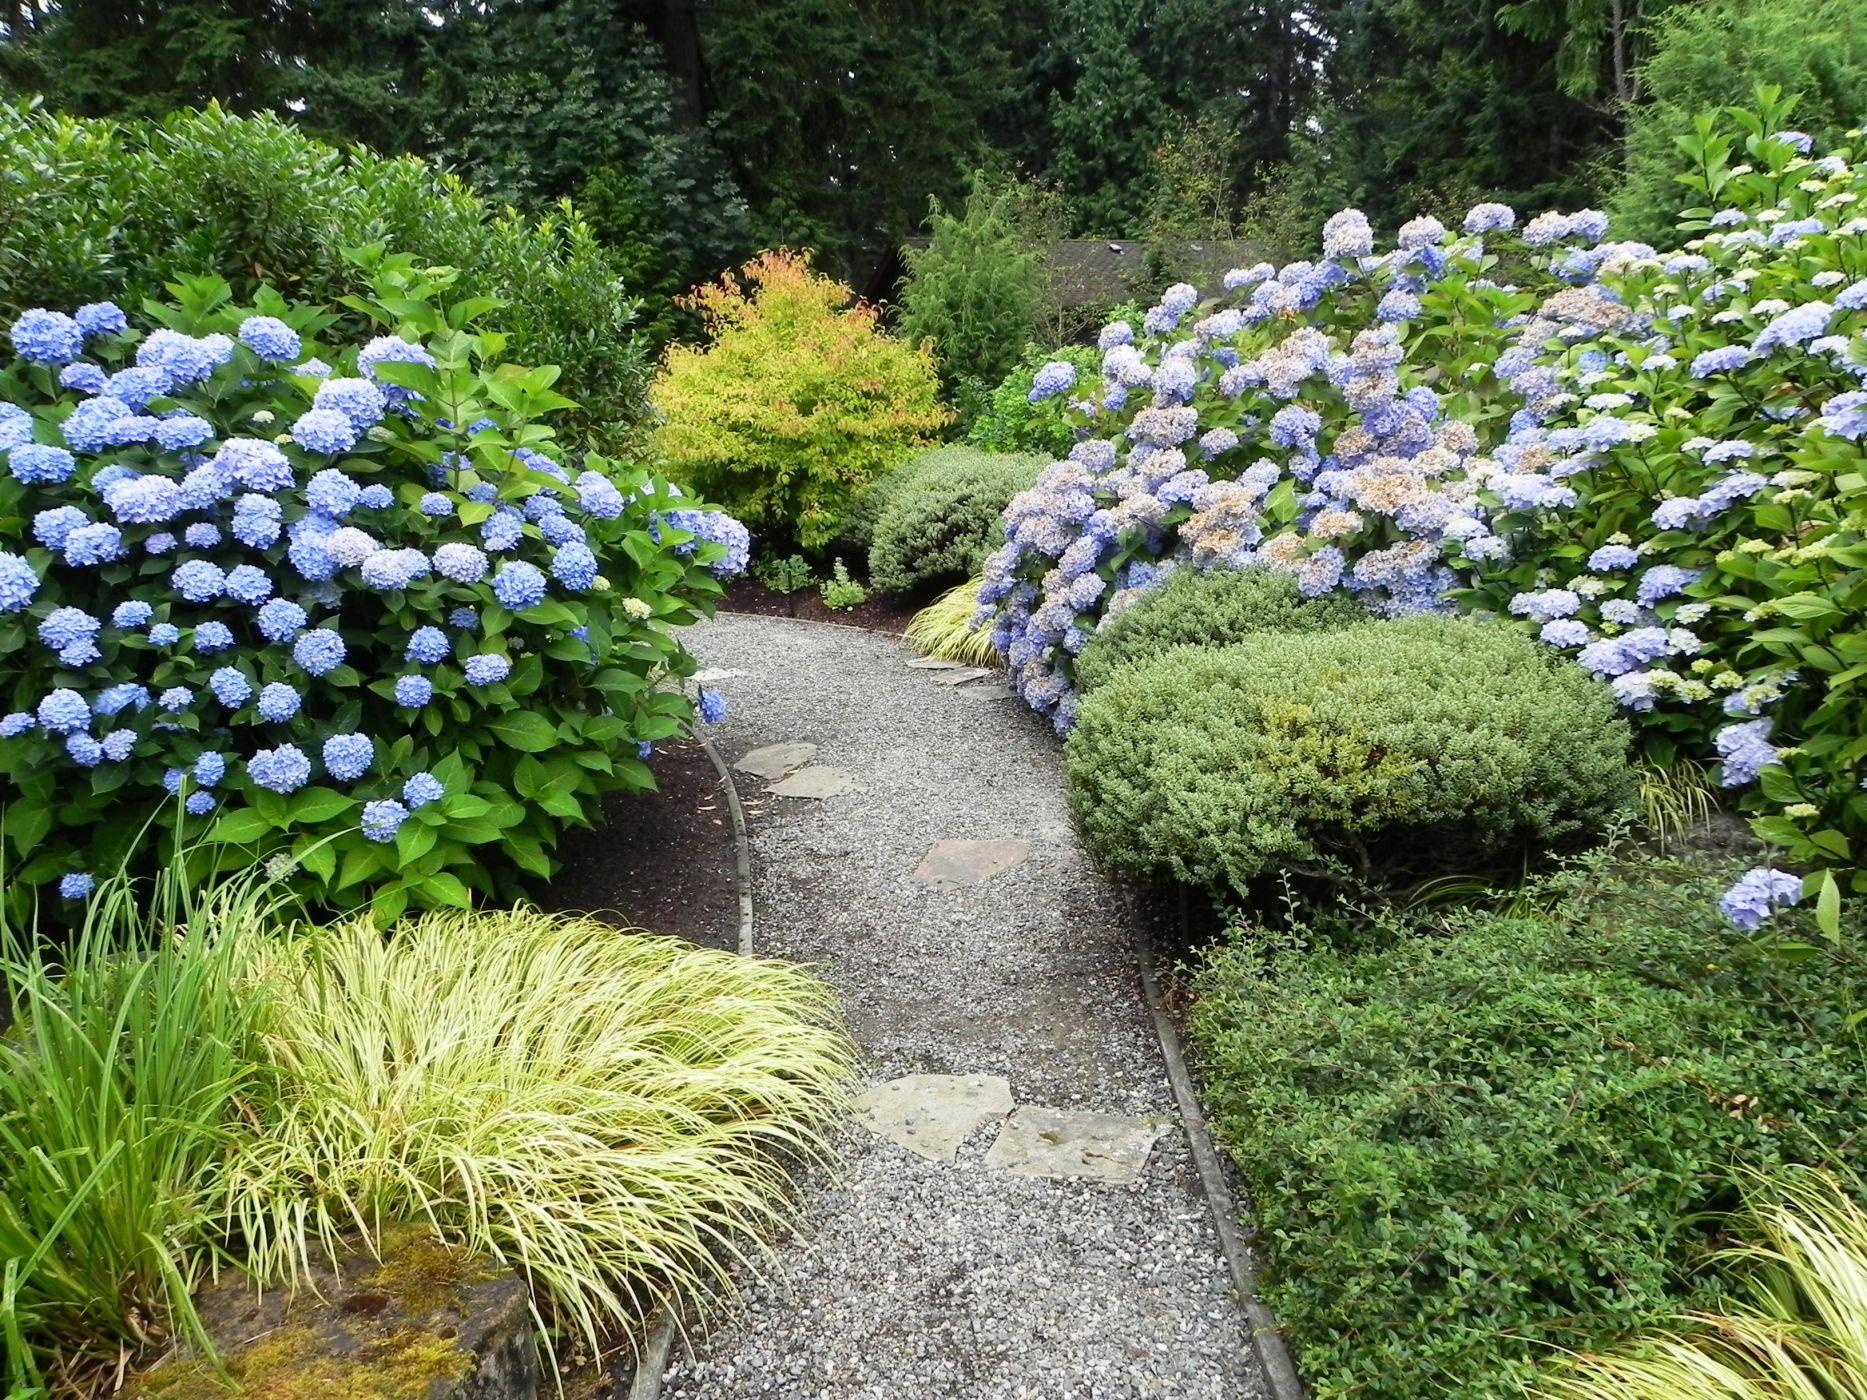 Hydrangea macrophylla sublime garden design landscape for Garden designs with hydrangeas